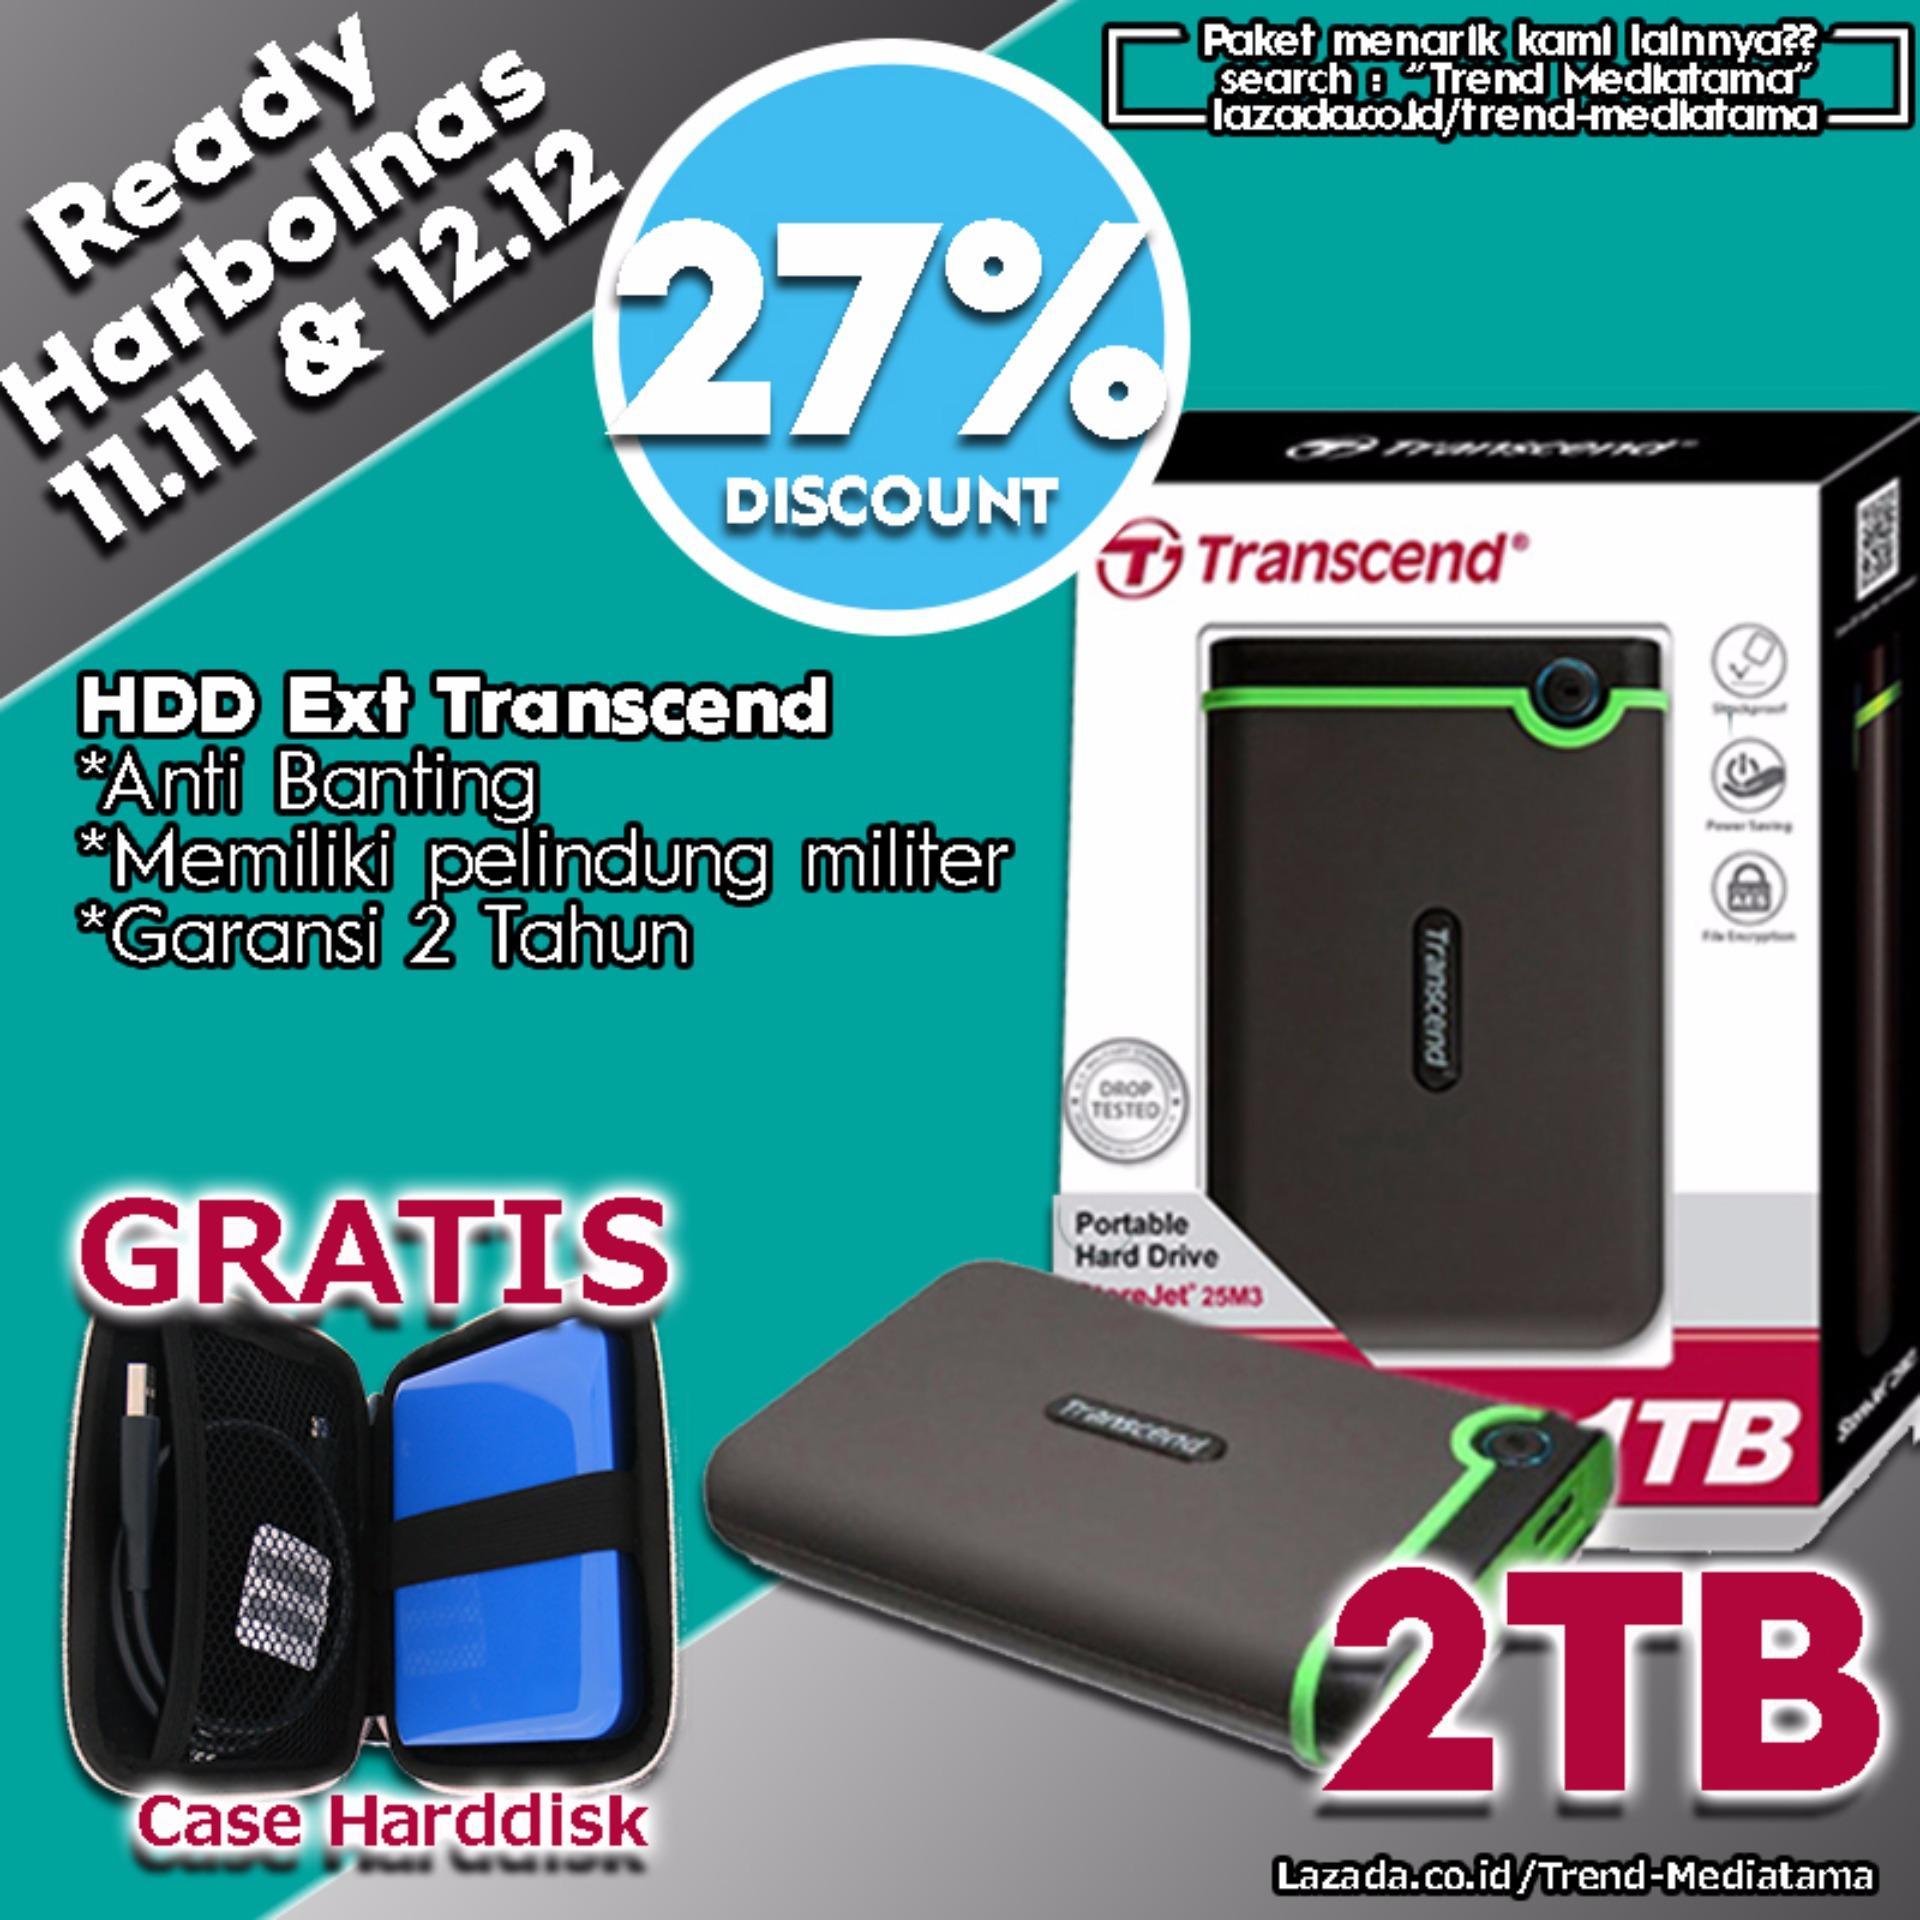 Transcend Harddisk Eksternal Antishock 25h3b 2tb Biru Update 1tb Hdd Type M Hardisk Anti Shock 25m3 B Blue Hard Drive External Banting 25h3p Ungu Gratis Source